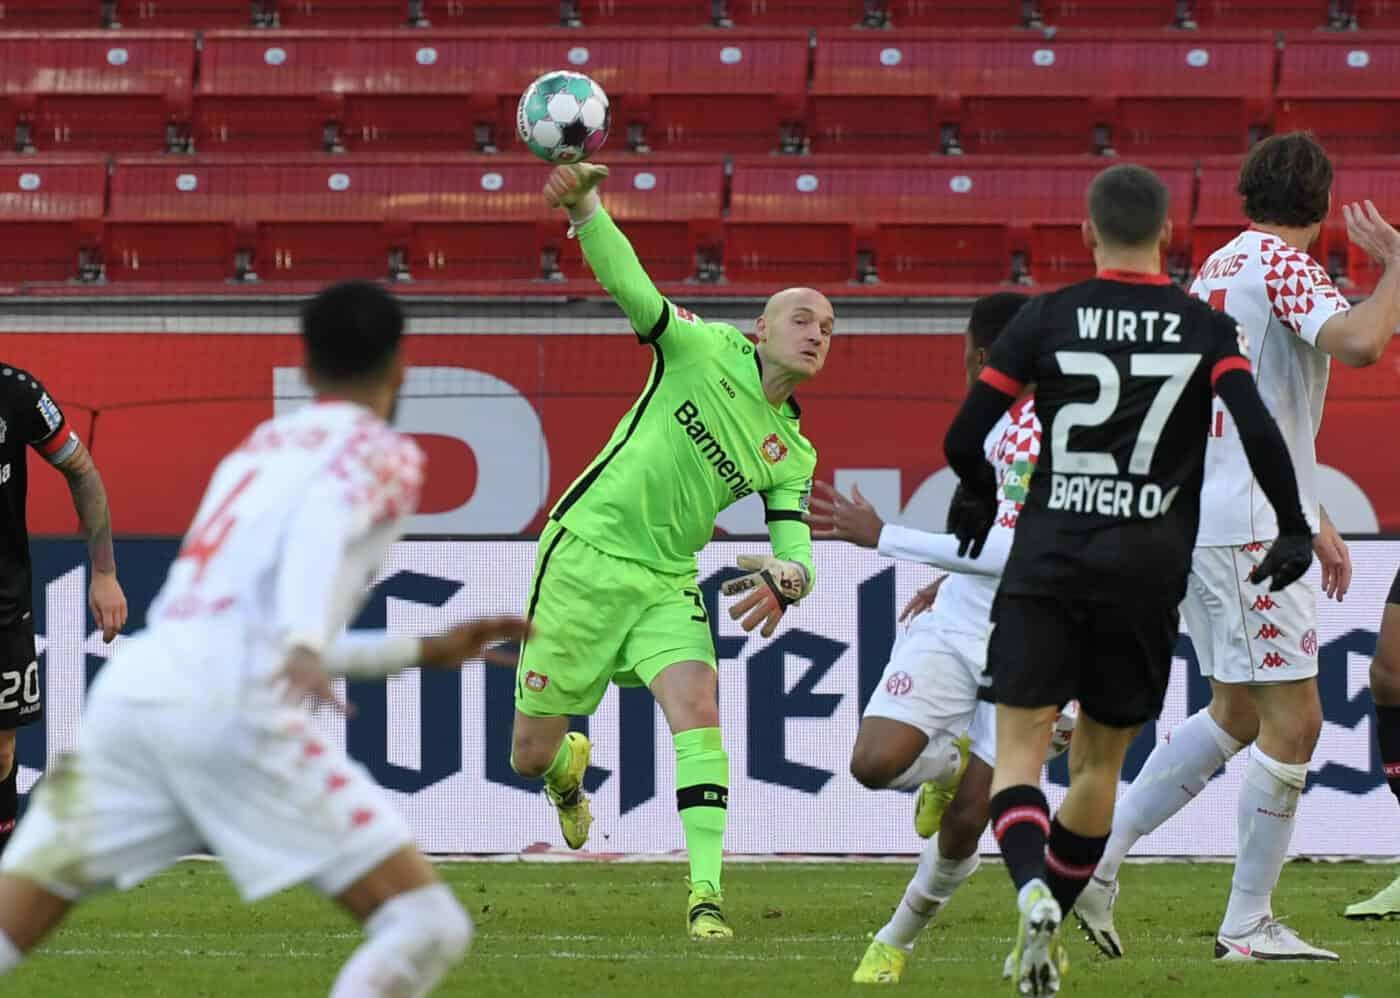 Young Boys Bern - Bayer 04 Leverkusen